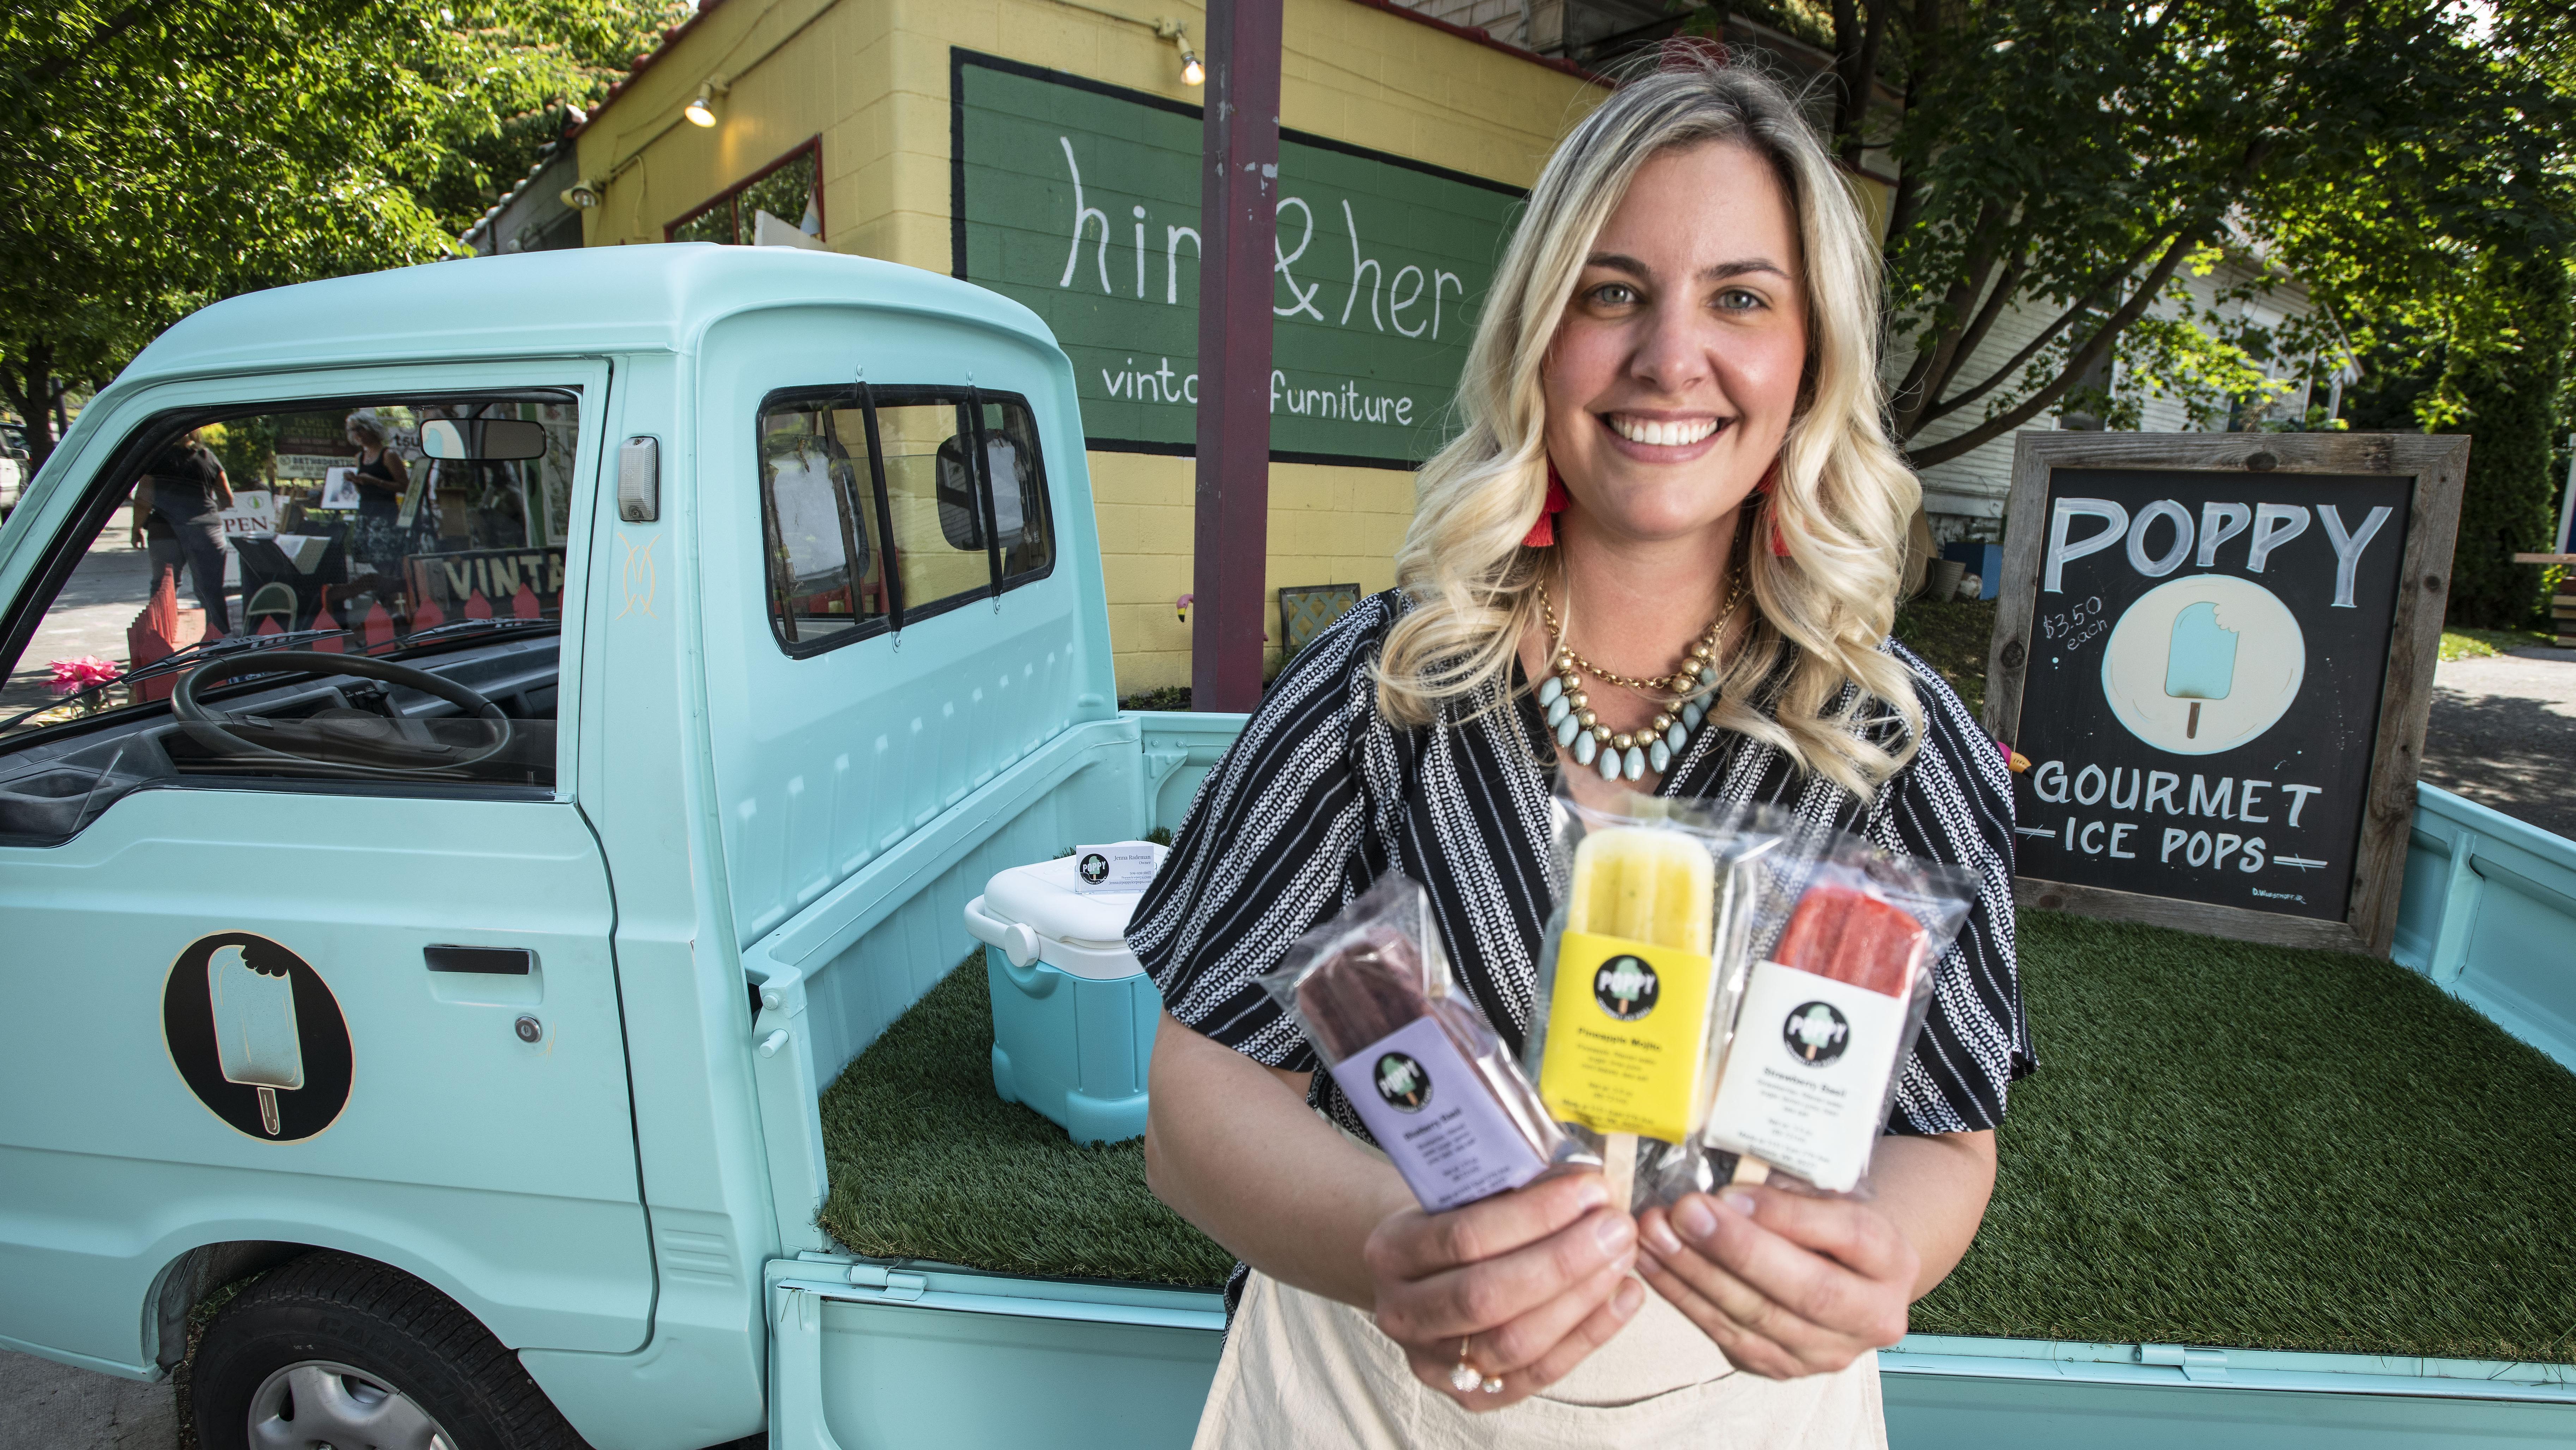 poppy gourmet ice pops debuts makes thursday market debut the